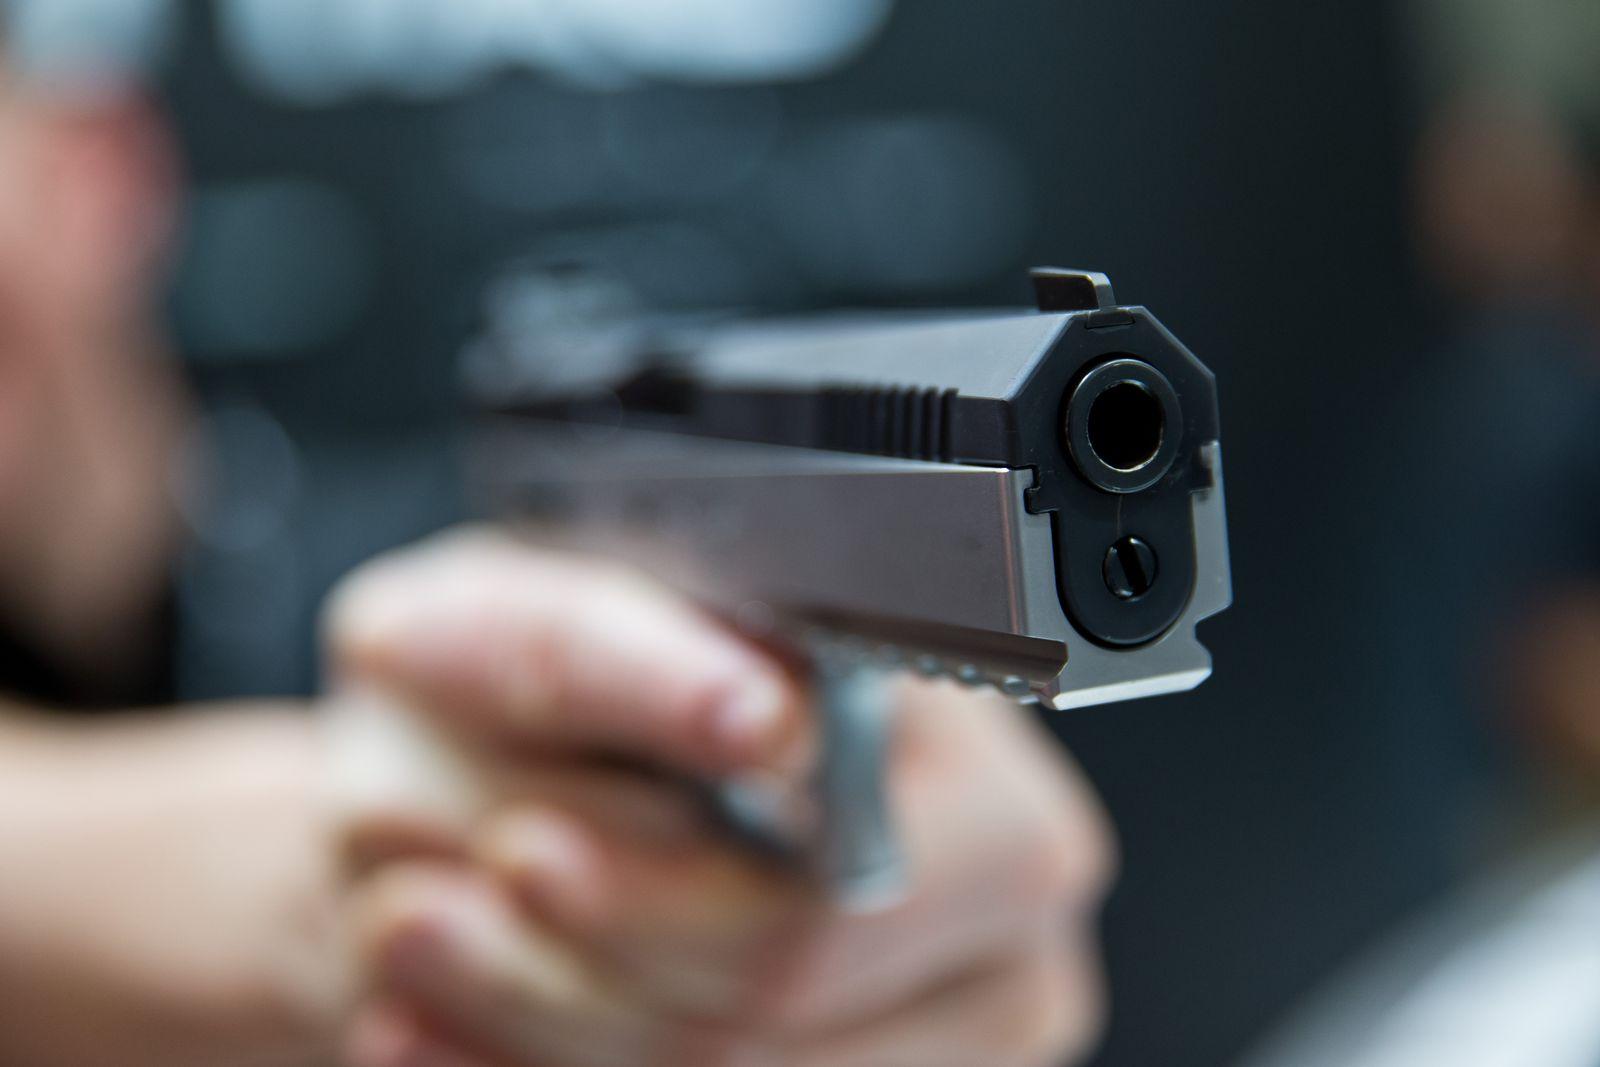 SYMBOLBILD Amok/ Waffe/ Pistole